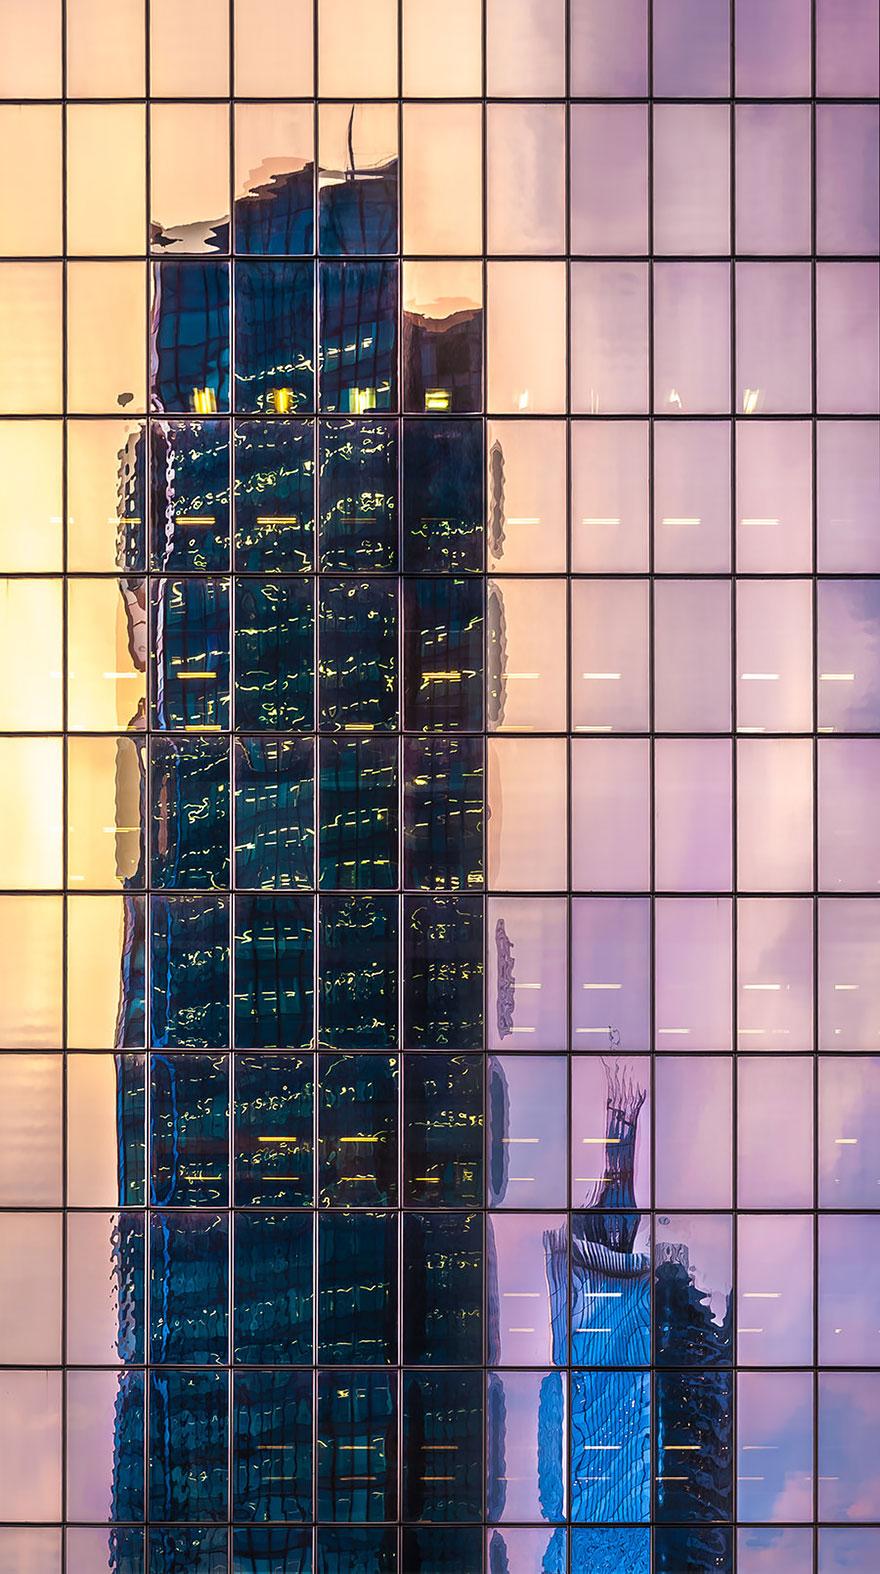 reflection-photography-36